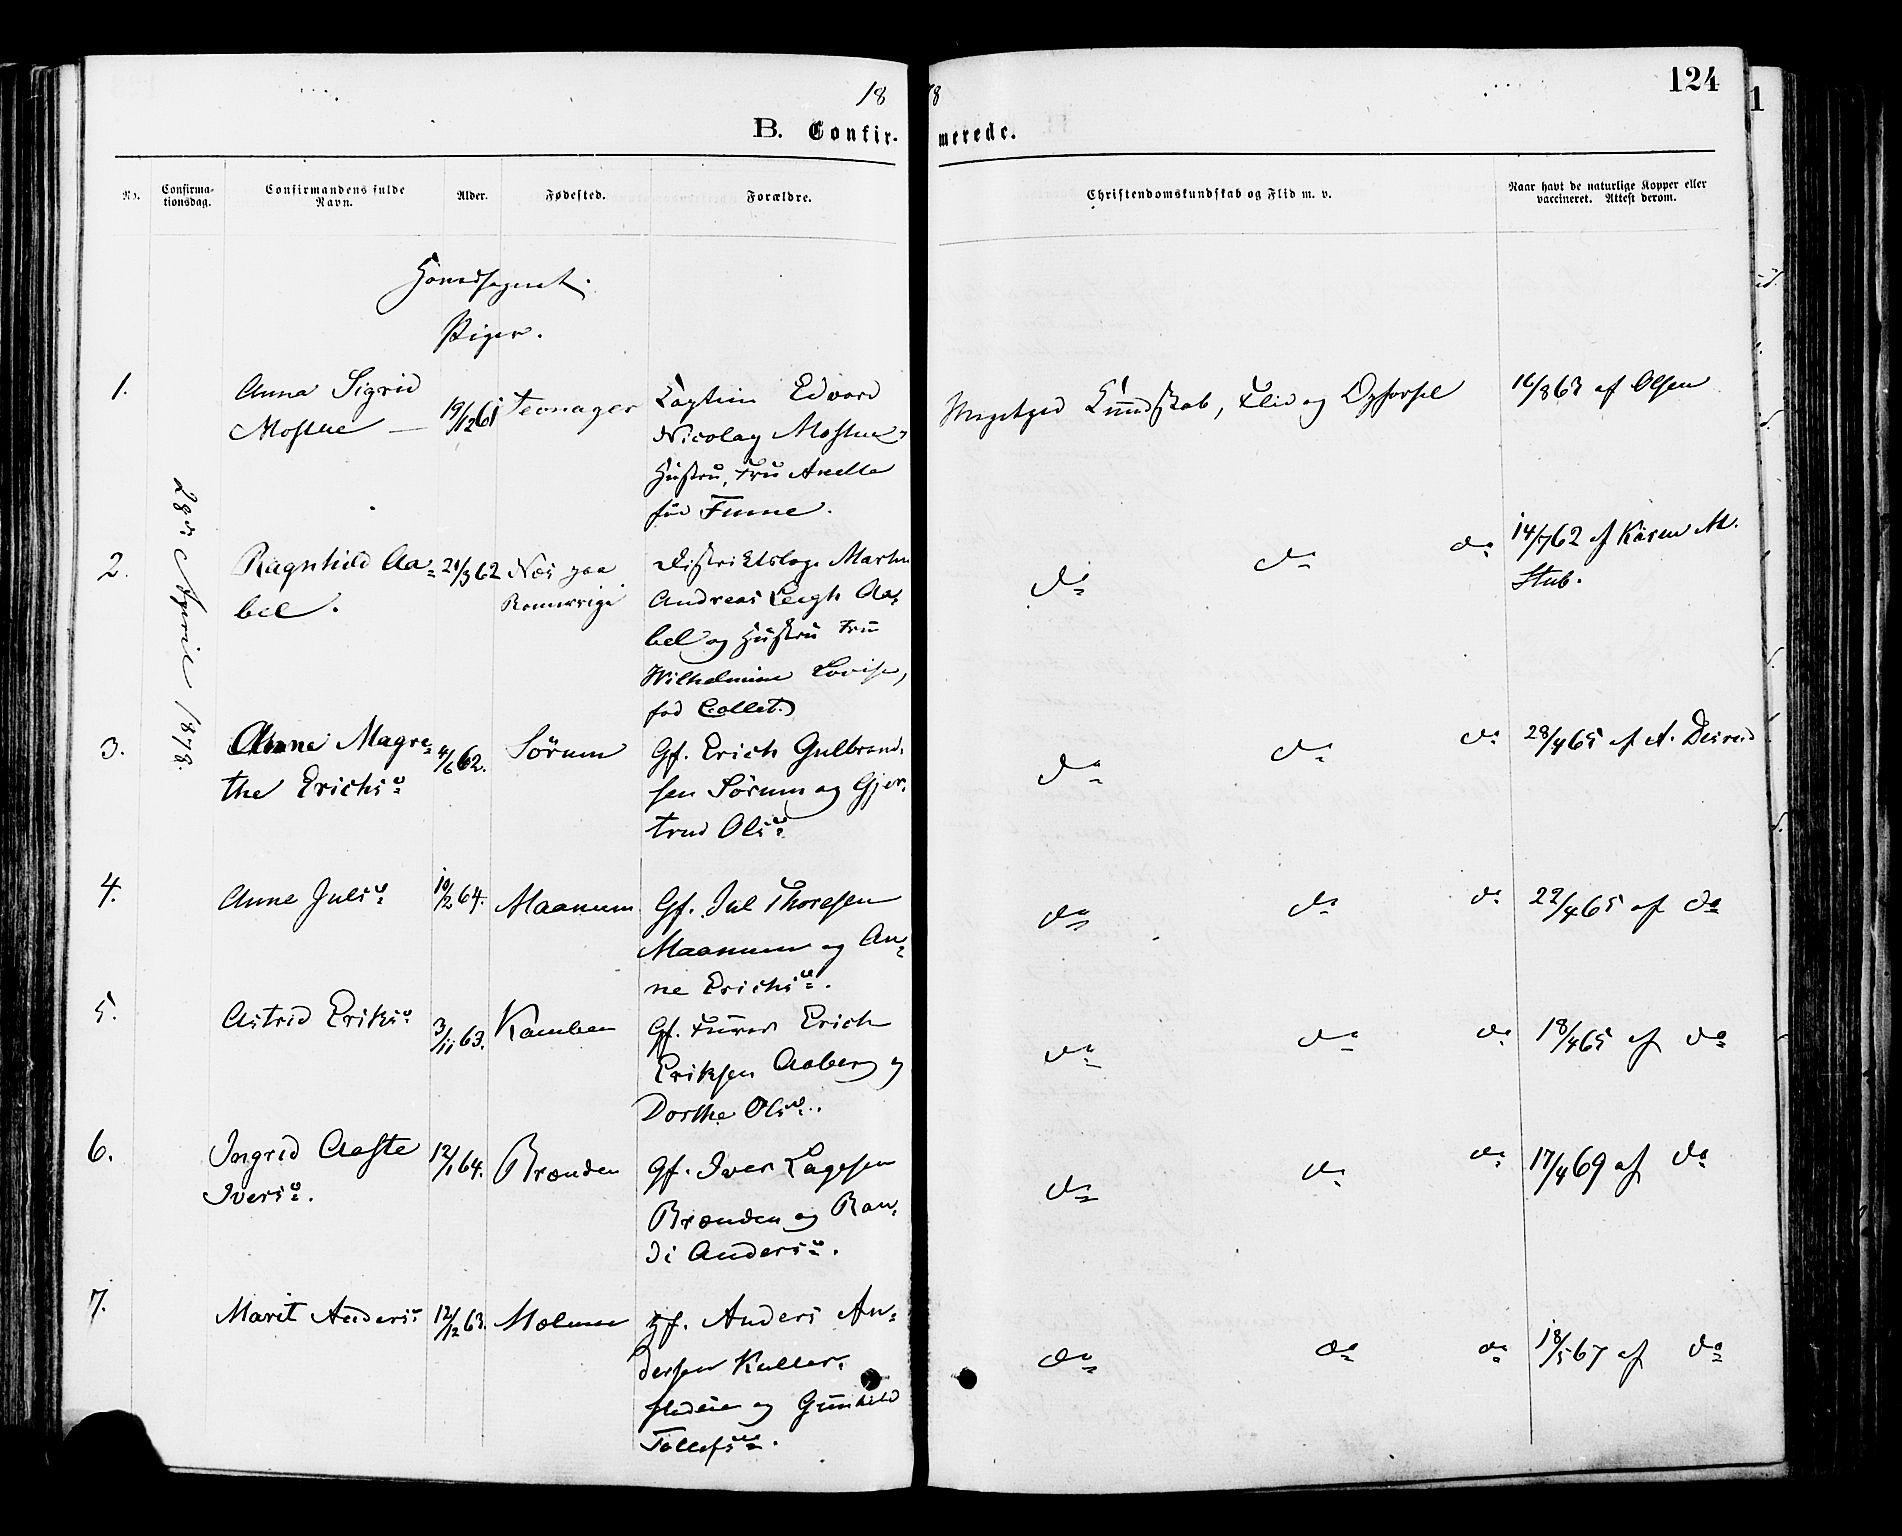 SAH, Nord-Aurdal prestekontor, Ministerialbok nr. 9, 1876-1882, s. 124